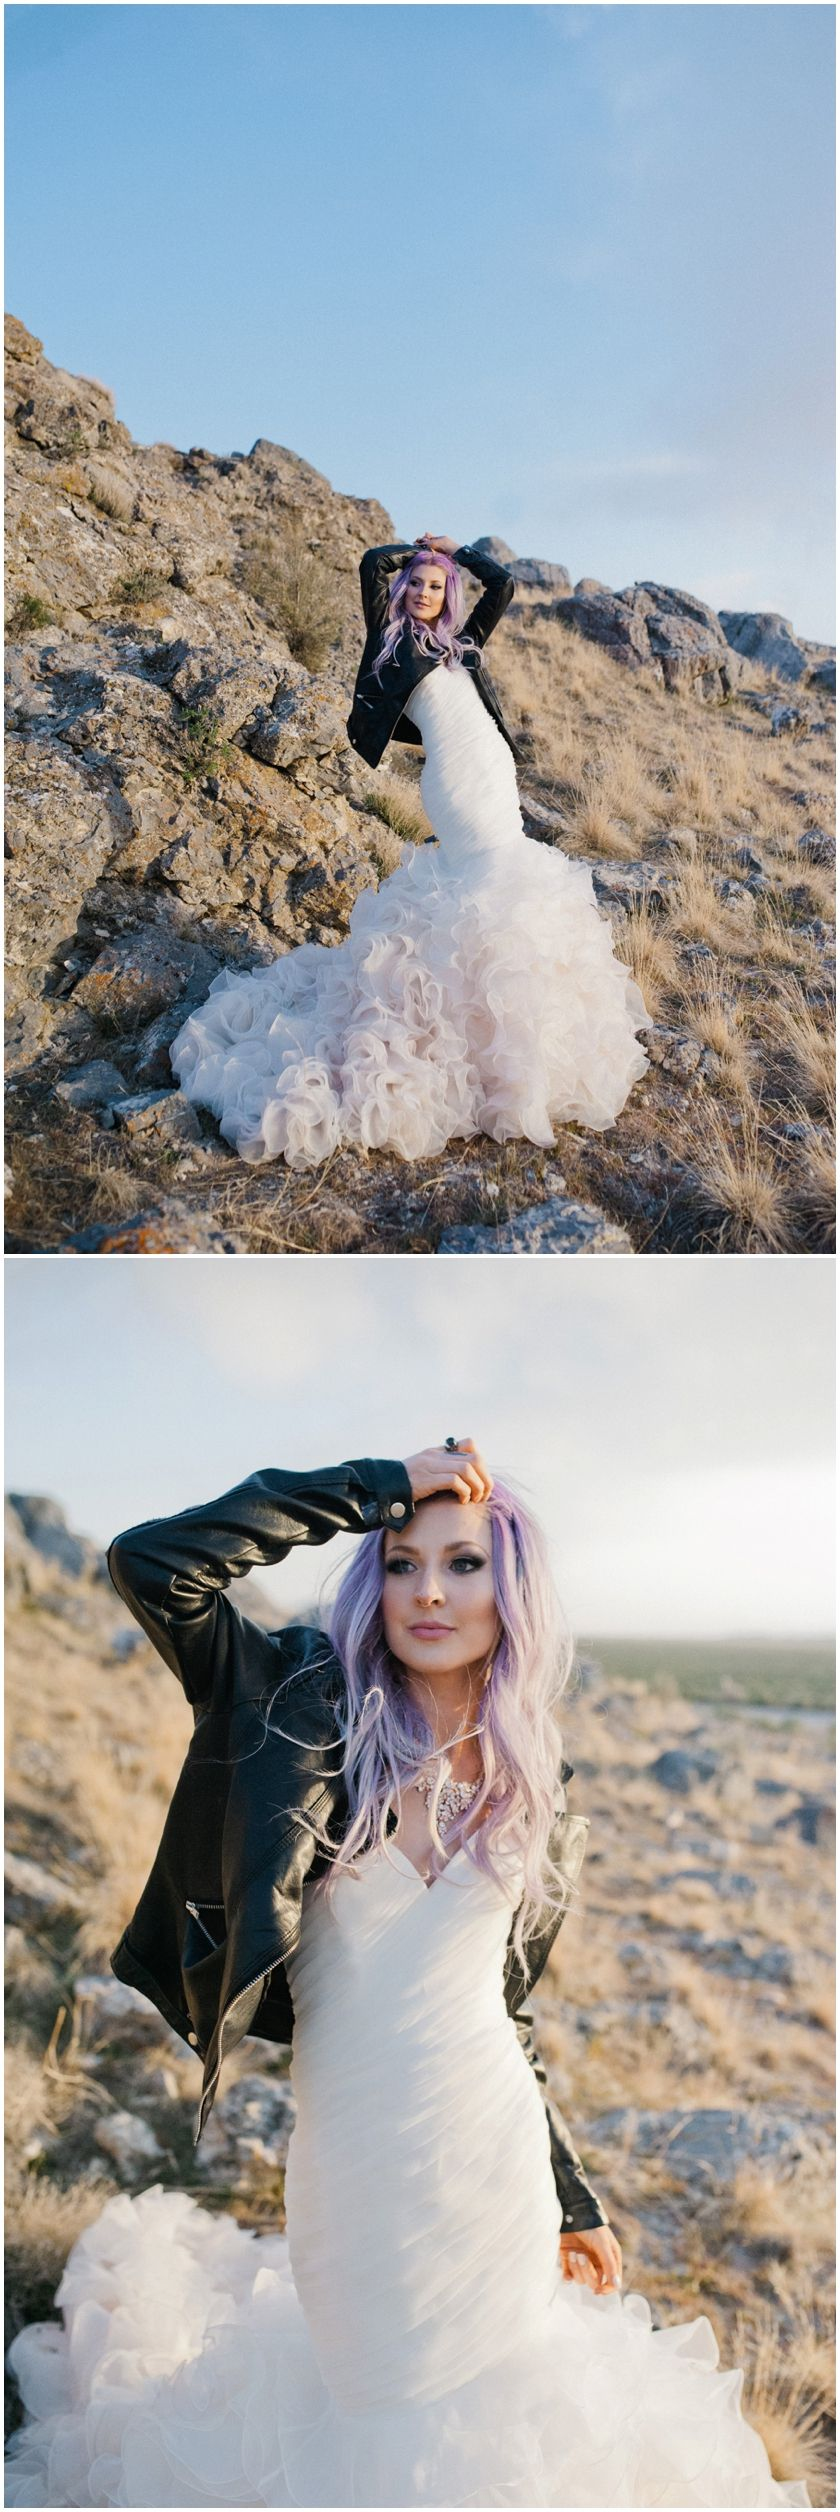 Purple camo wedding dresses   best wedding images on Pinterest  Wedding dressses Wedding and